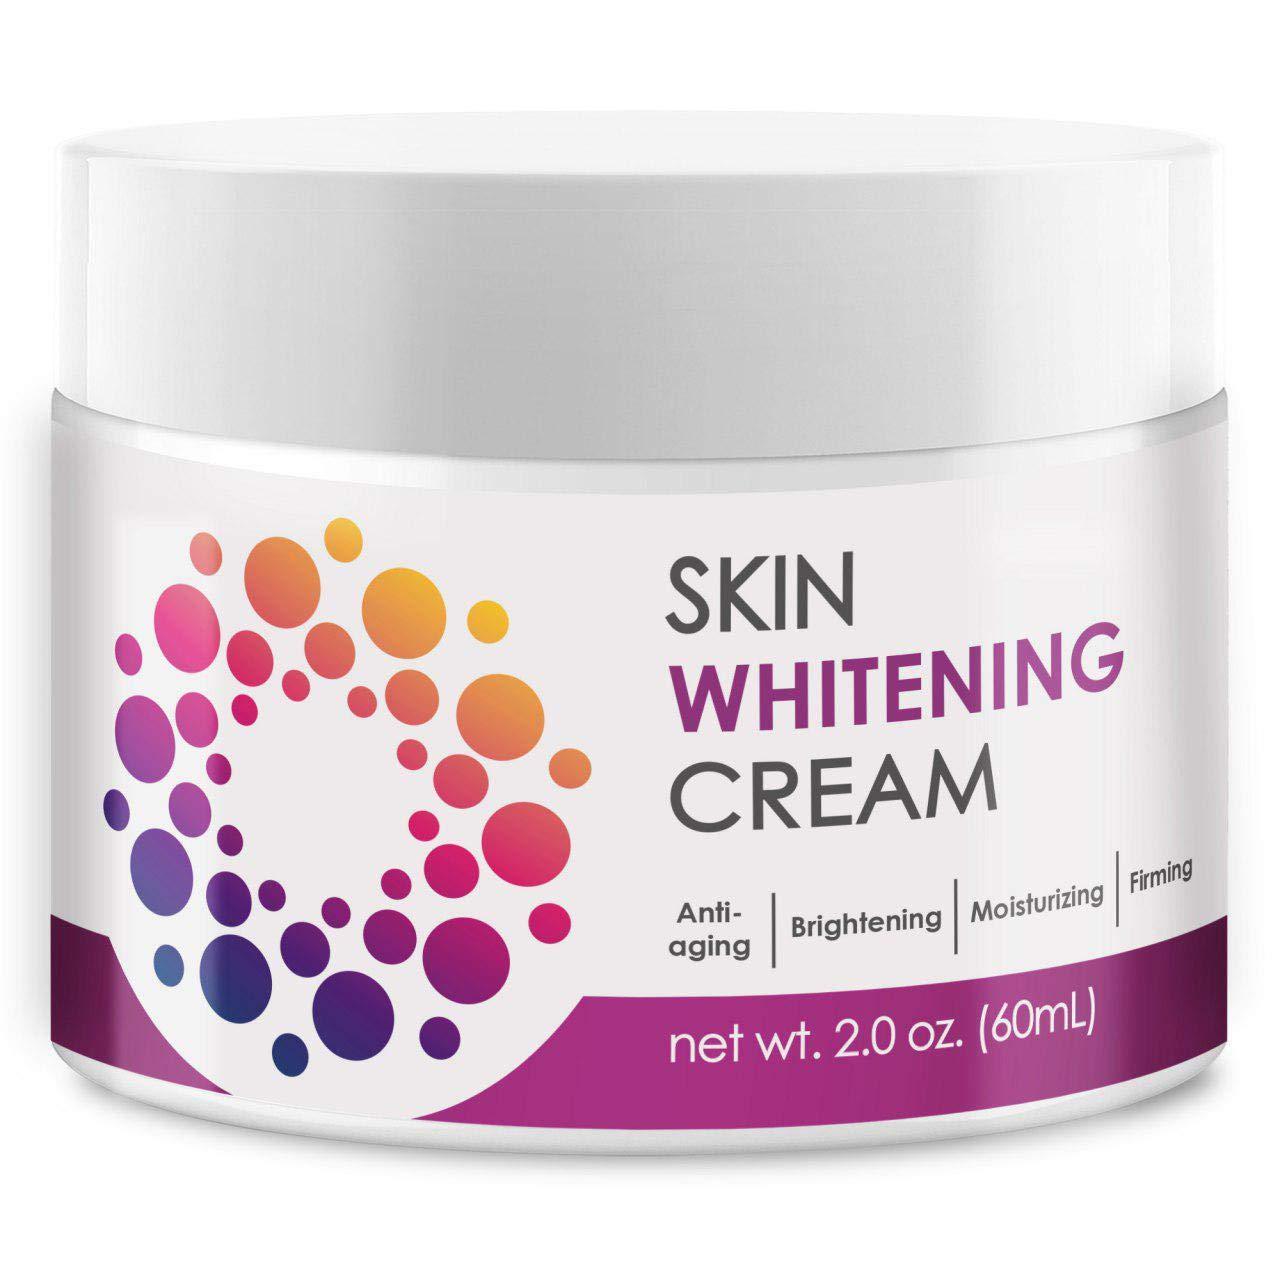 ACTIVSCIENCE Whitening Cream - Powerful Skin Lightening Cream for Face & Body. Dark Spot, Melasma & Hyperpigmentation Treatment. 2 fl oz. by ACTIVSCIENCE